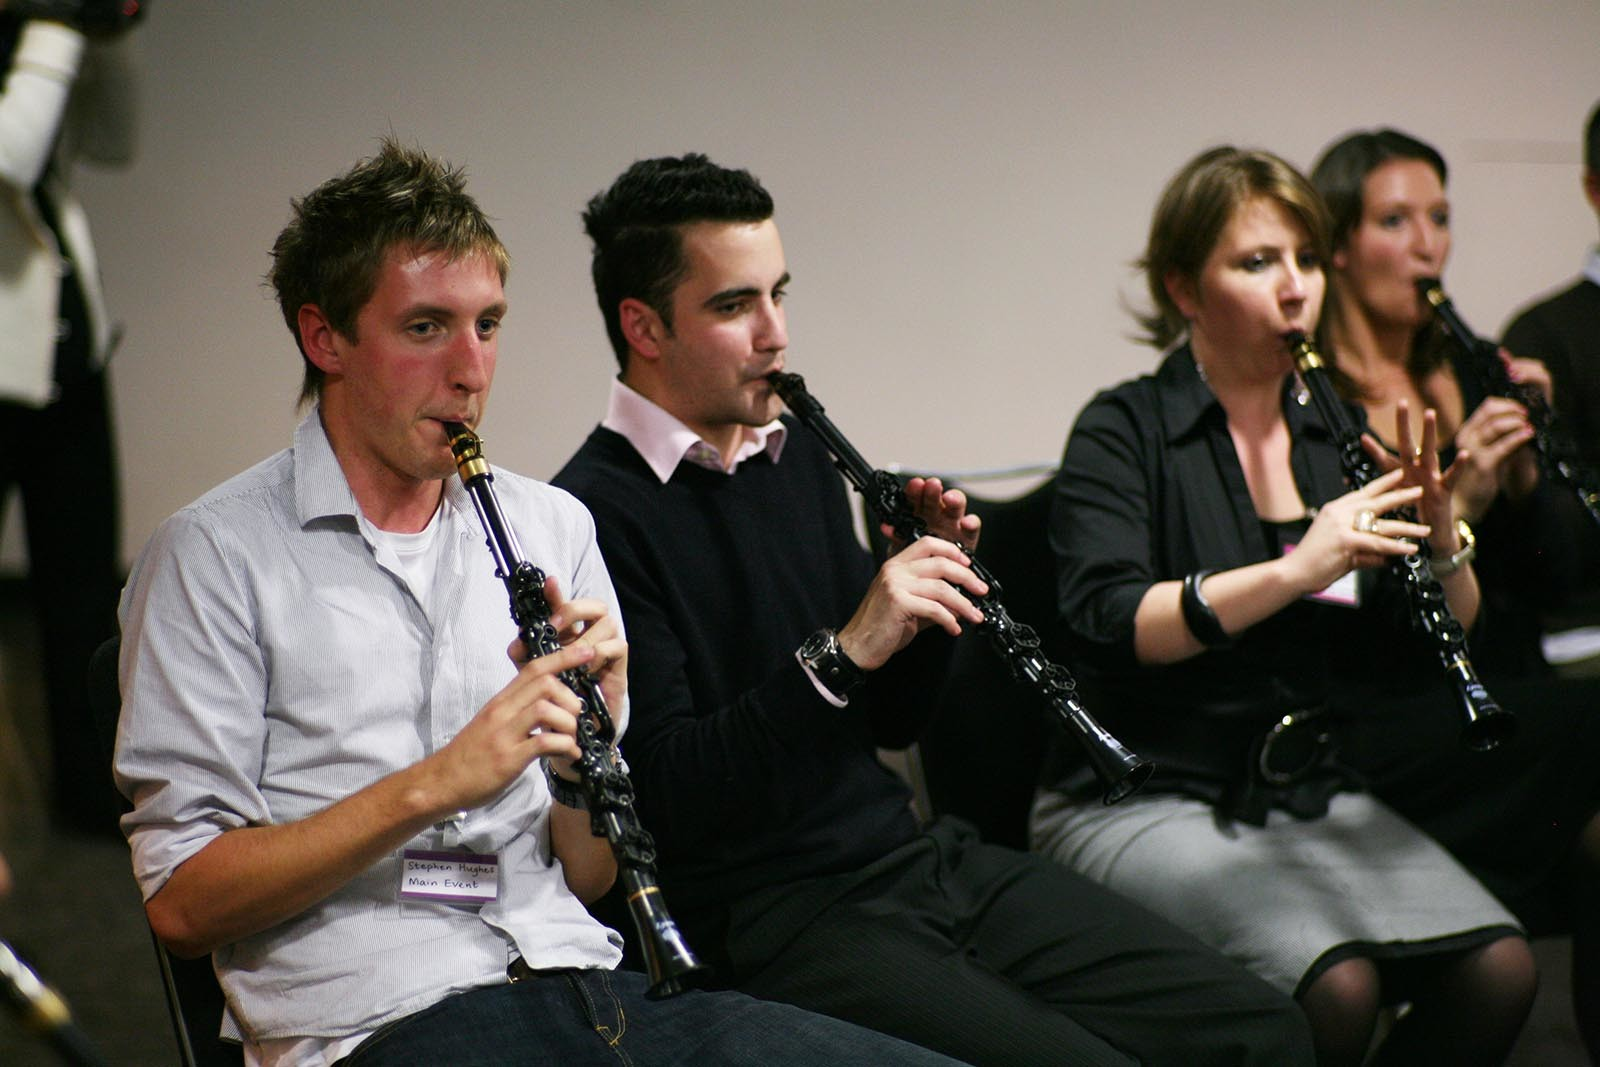 V aktivite Orchestrate hraje nekdo na housle a nekdo na zestove nastroje